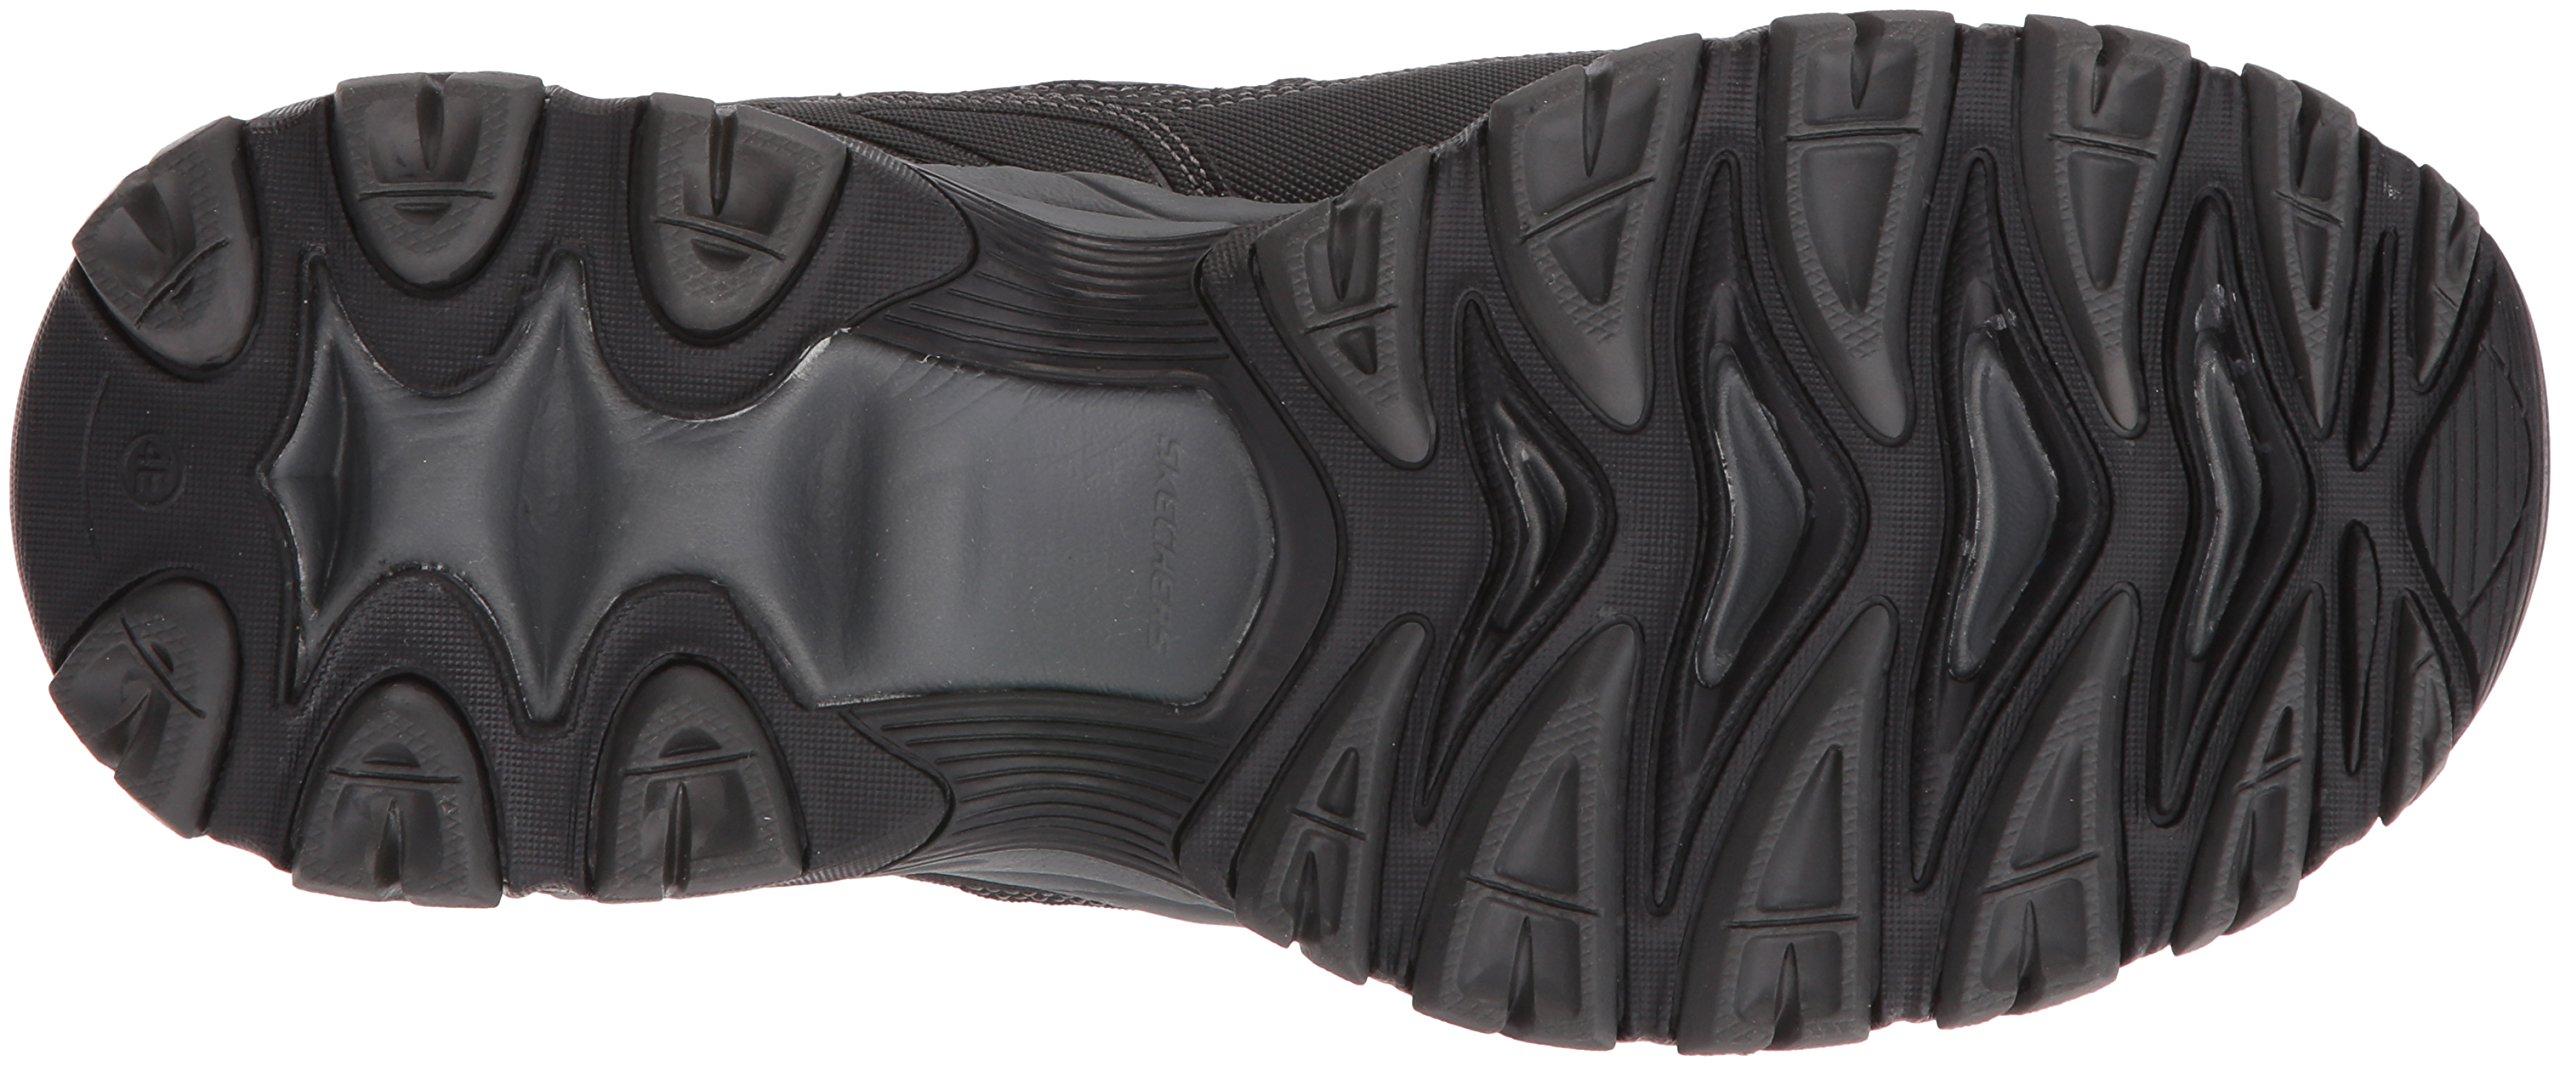 Skechers Men's AFTERBURNM.FIT Memory Foam Lace-Up Sneaker, Black, 6.5 M US by Skechers (Image #3)